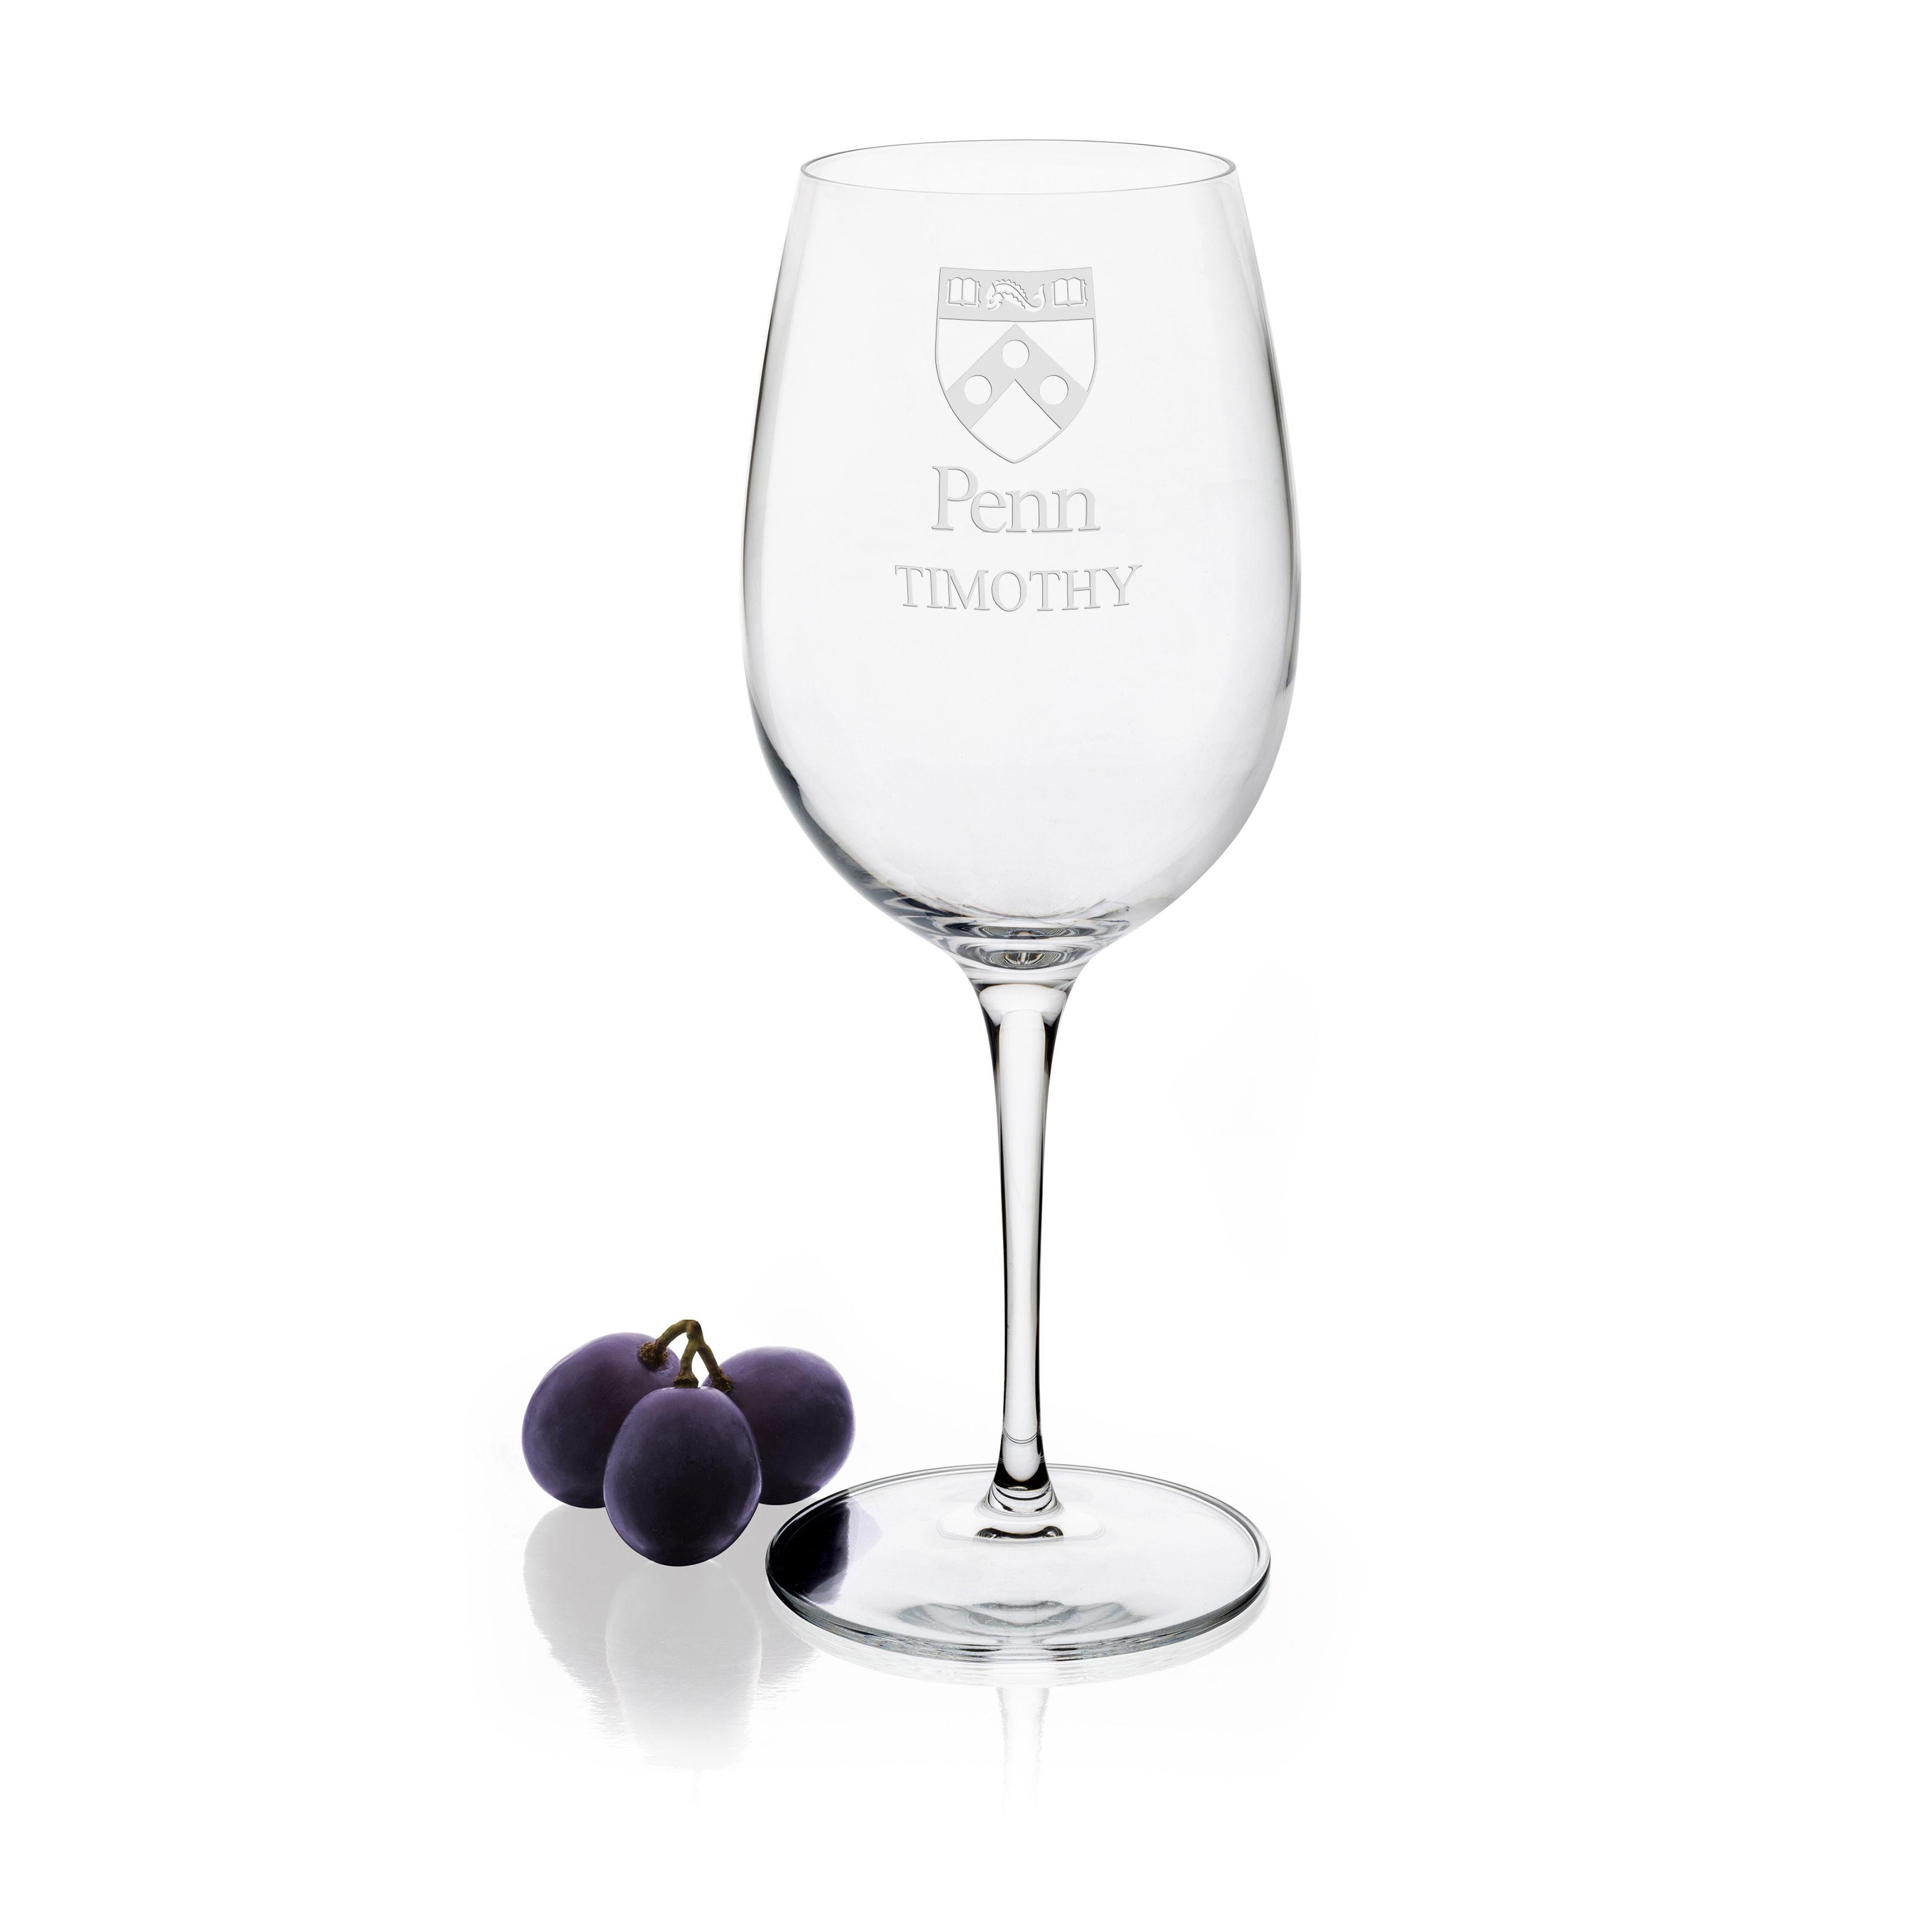 University of Pennsylvania Red Wine Glasses - Set of 4